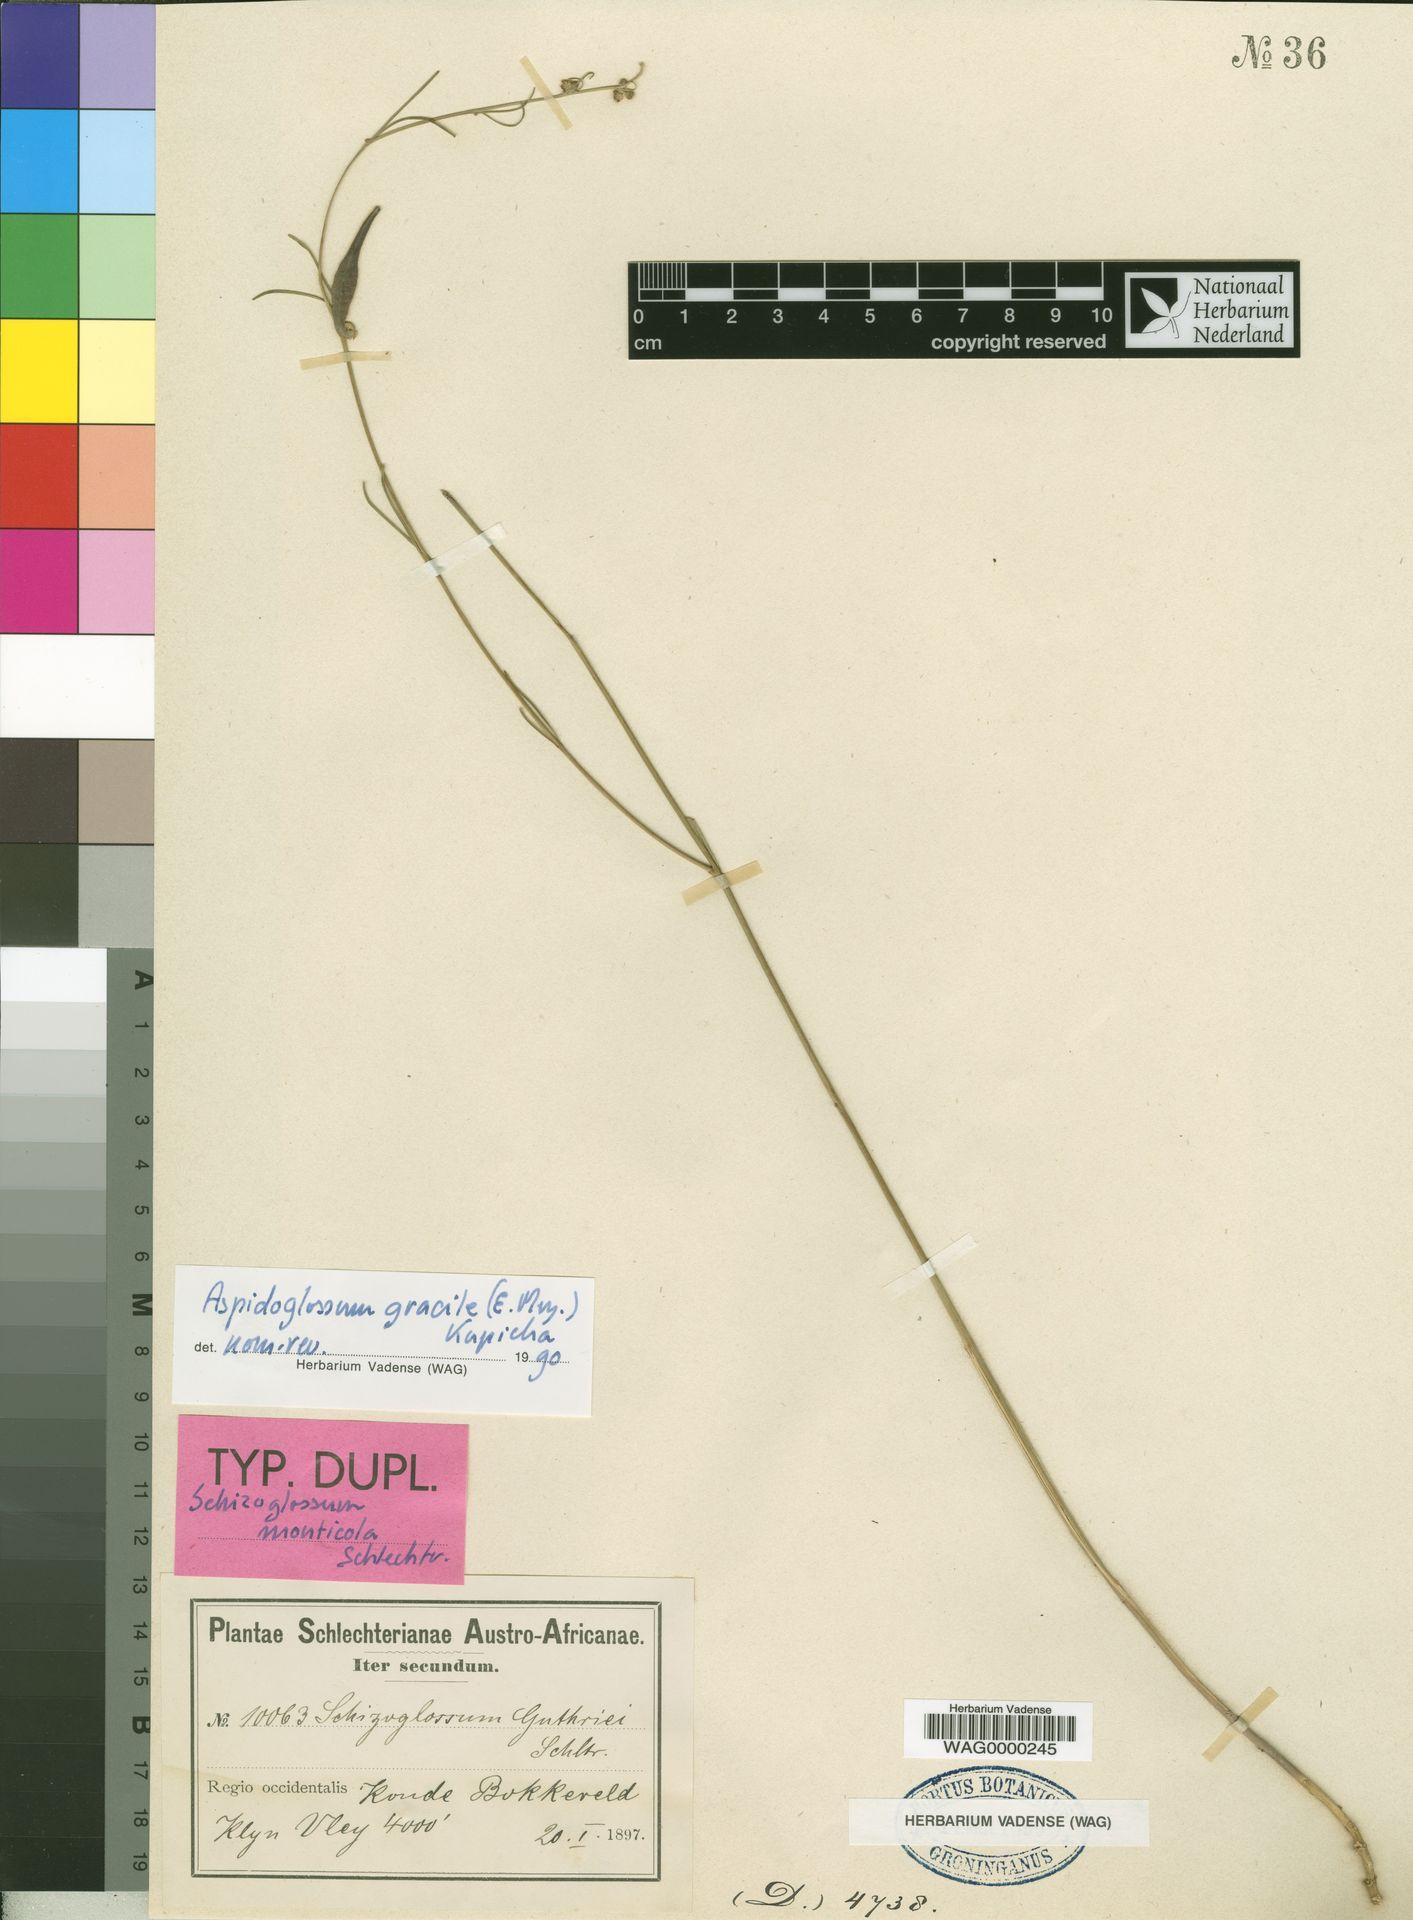 WAG0000245   Aspidoglossum gracile (E.Mey.) Kupicha